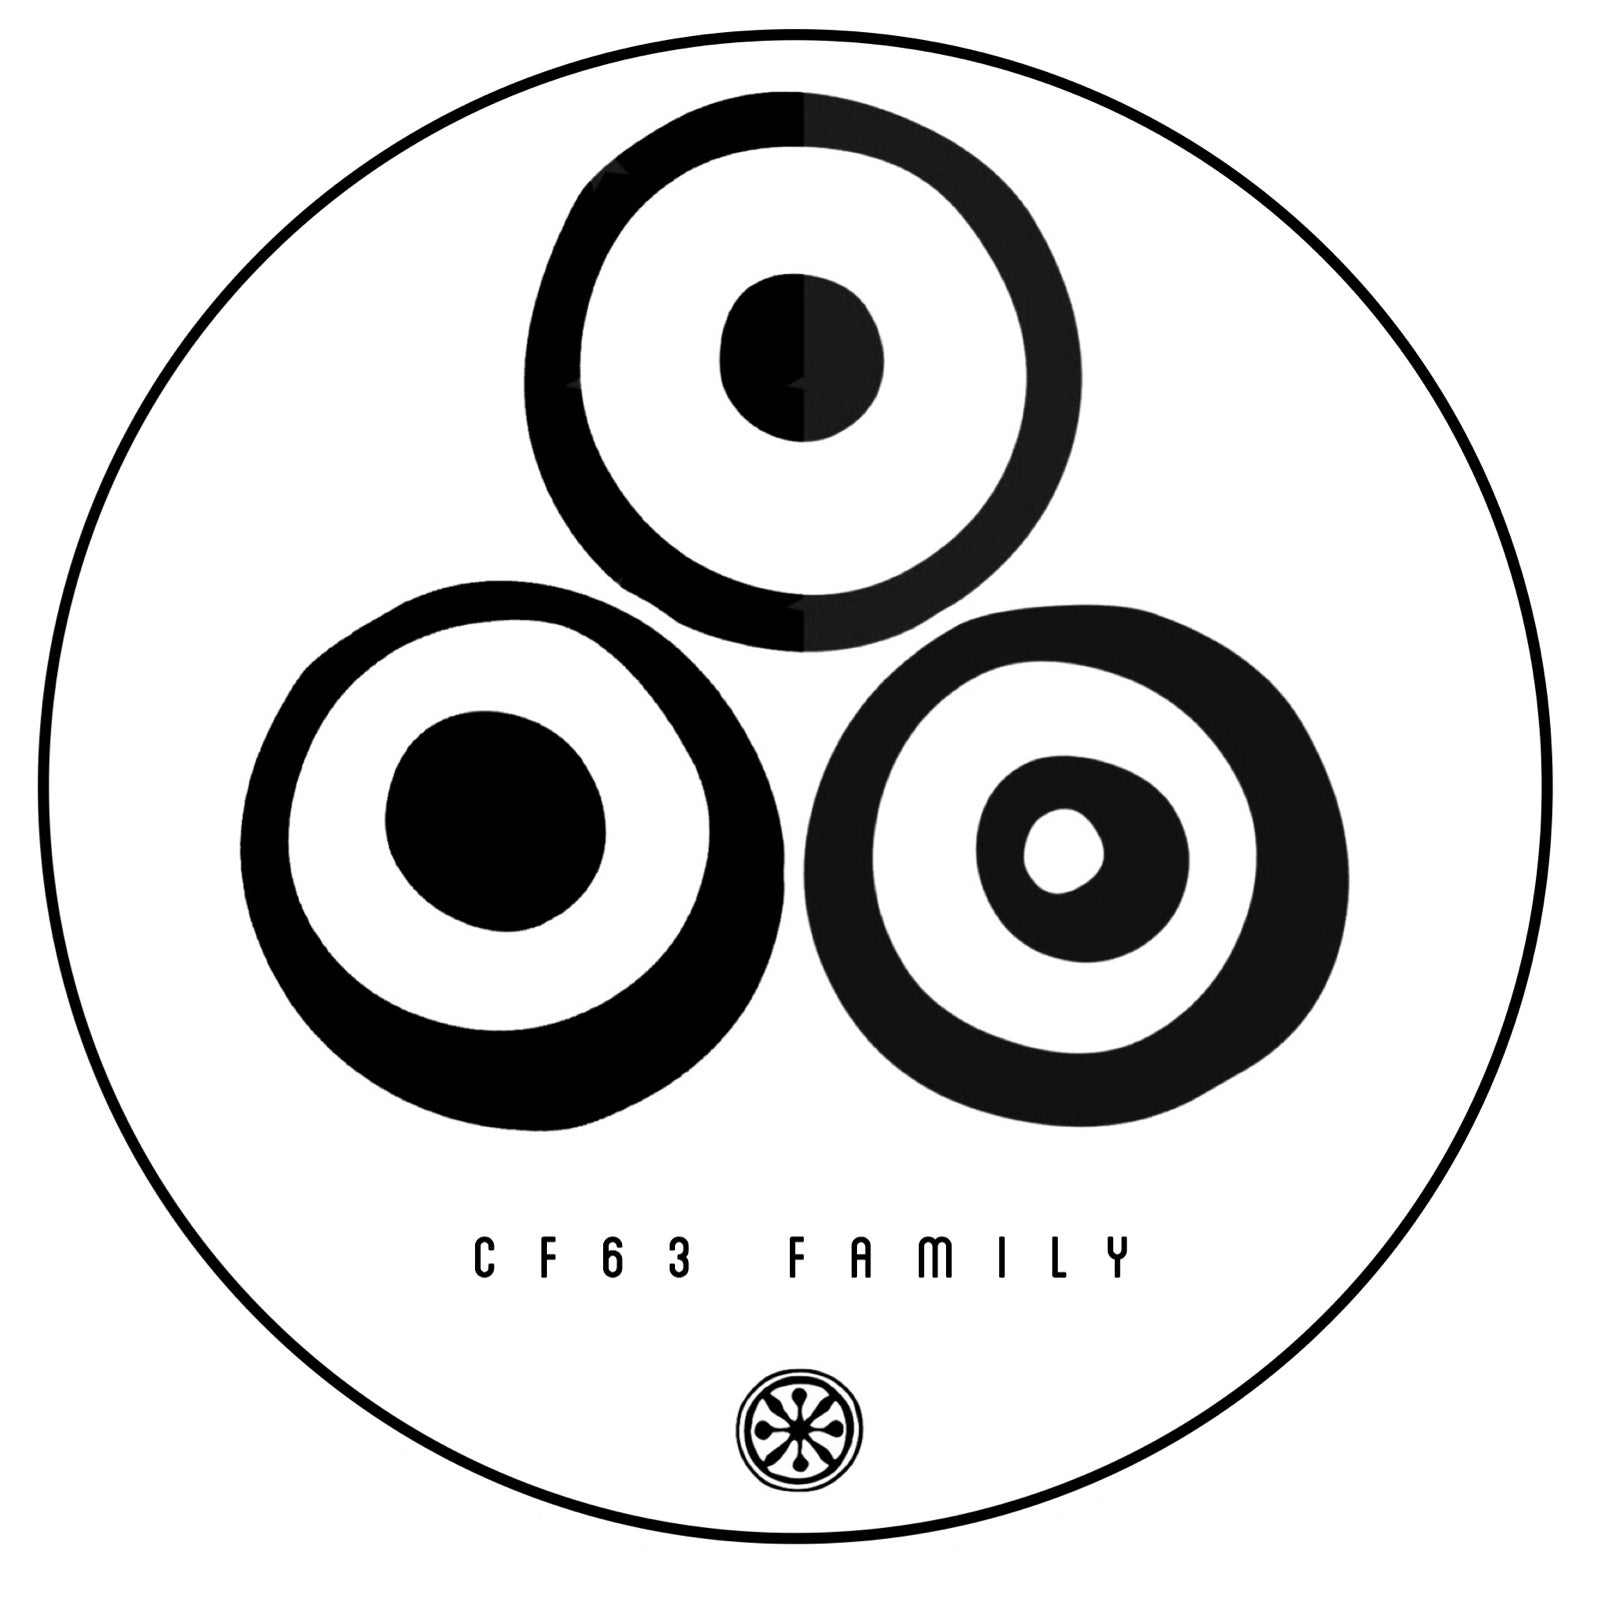 Home Cf63 Family